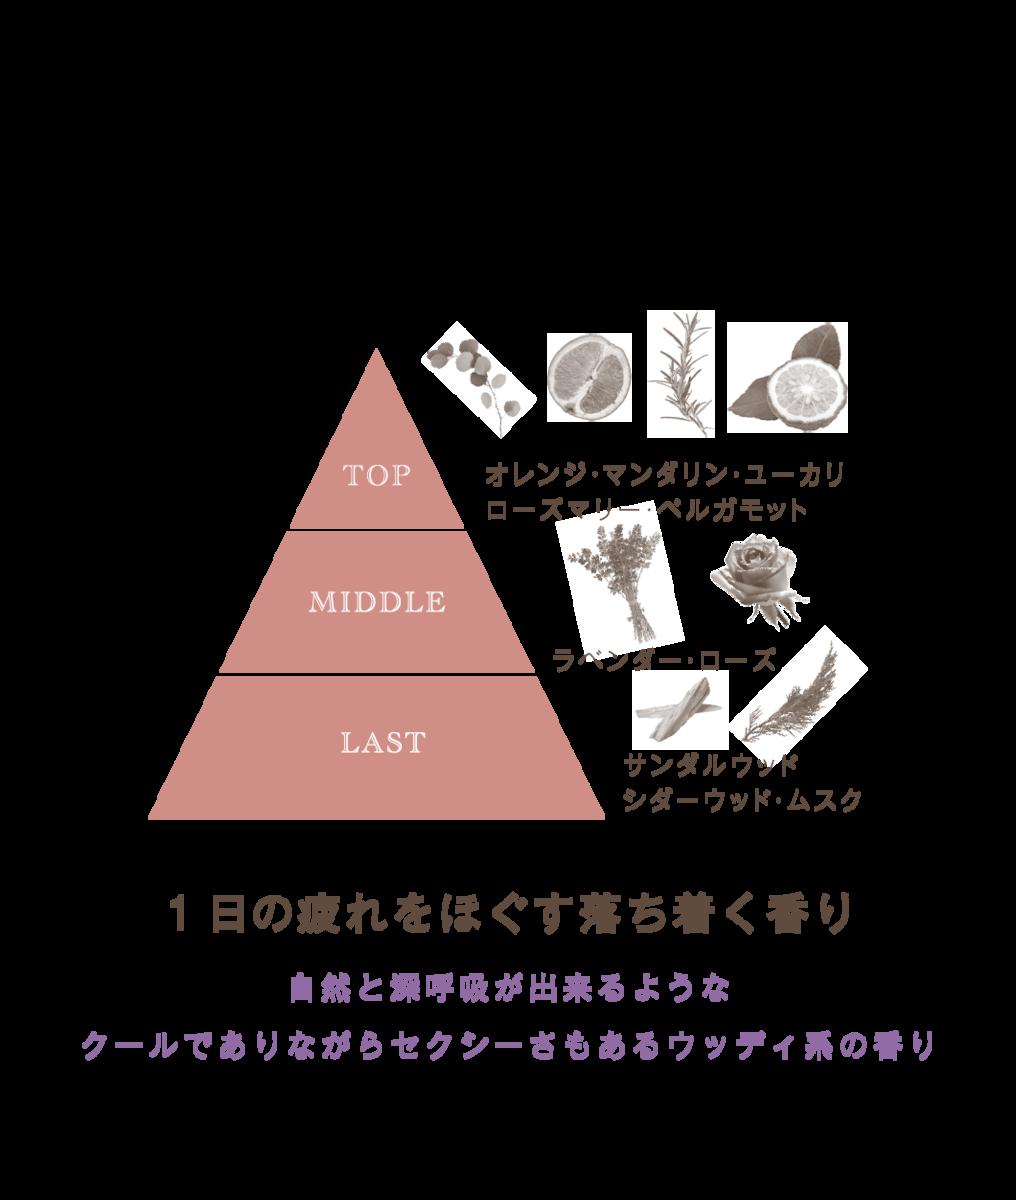 f:id:yakudacchi:20201125163030p:plain